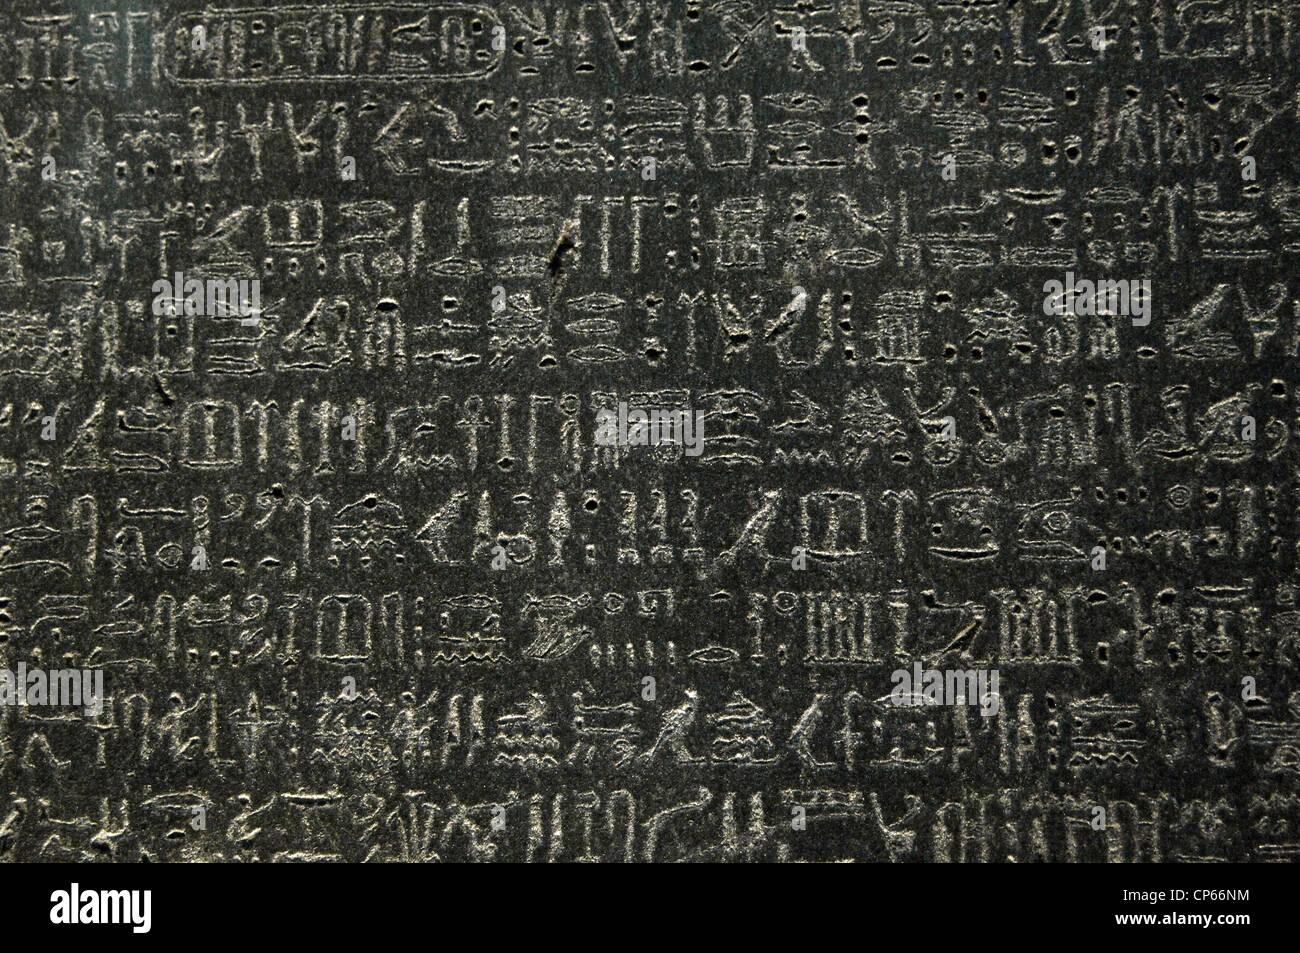 The Rosetta Stone. Ptolemaic era. 196 BC. Detail. Hieroglyphical scripture. - Stock Image